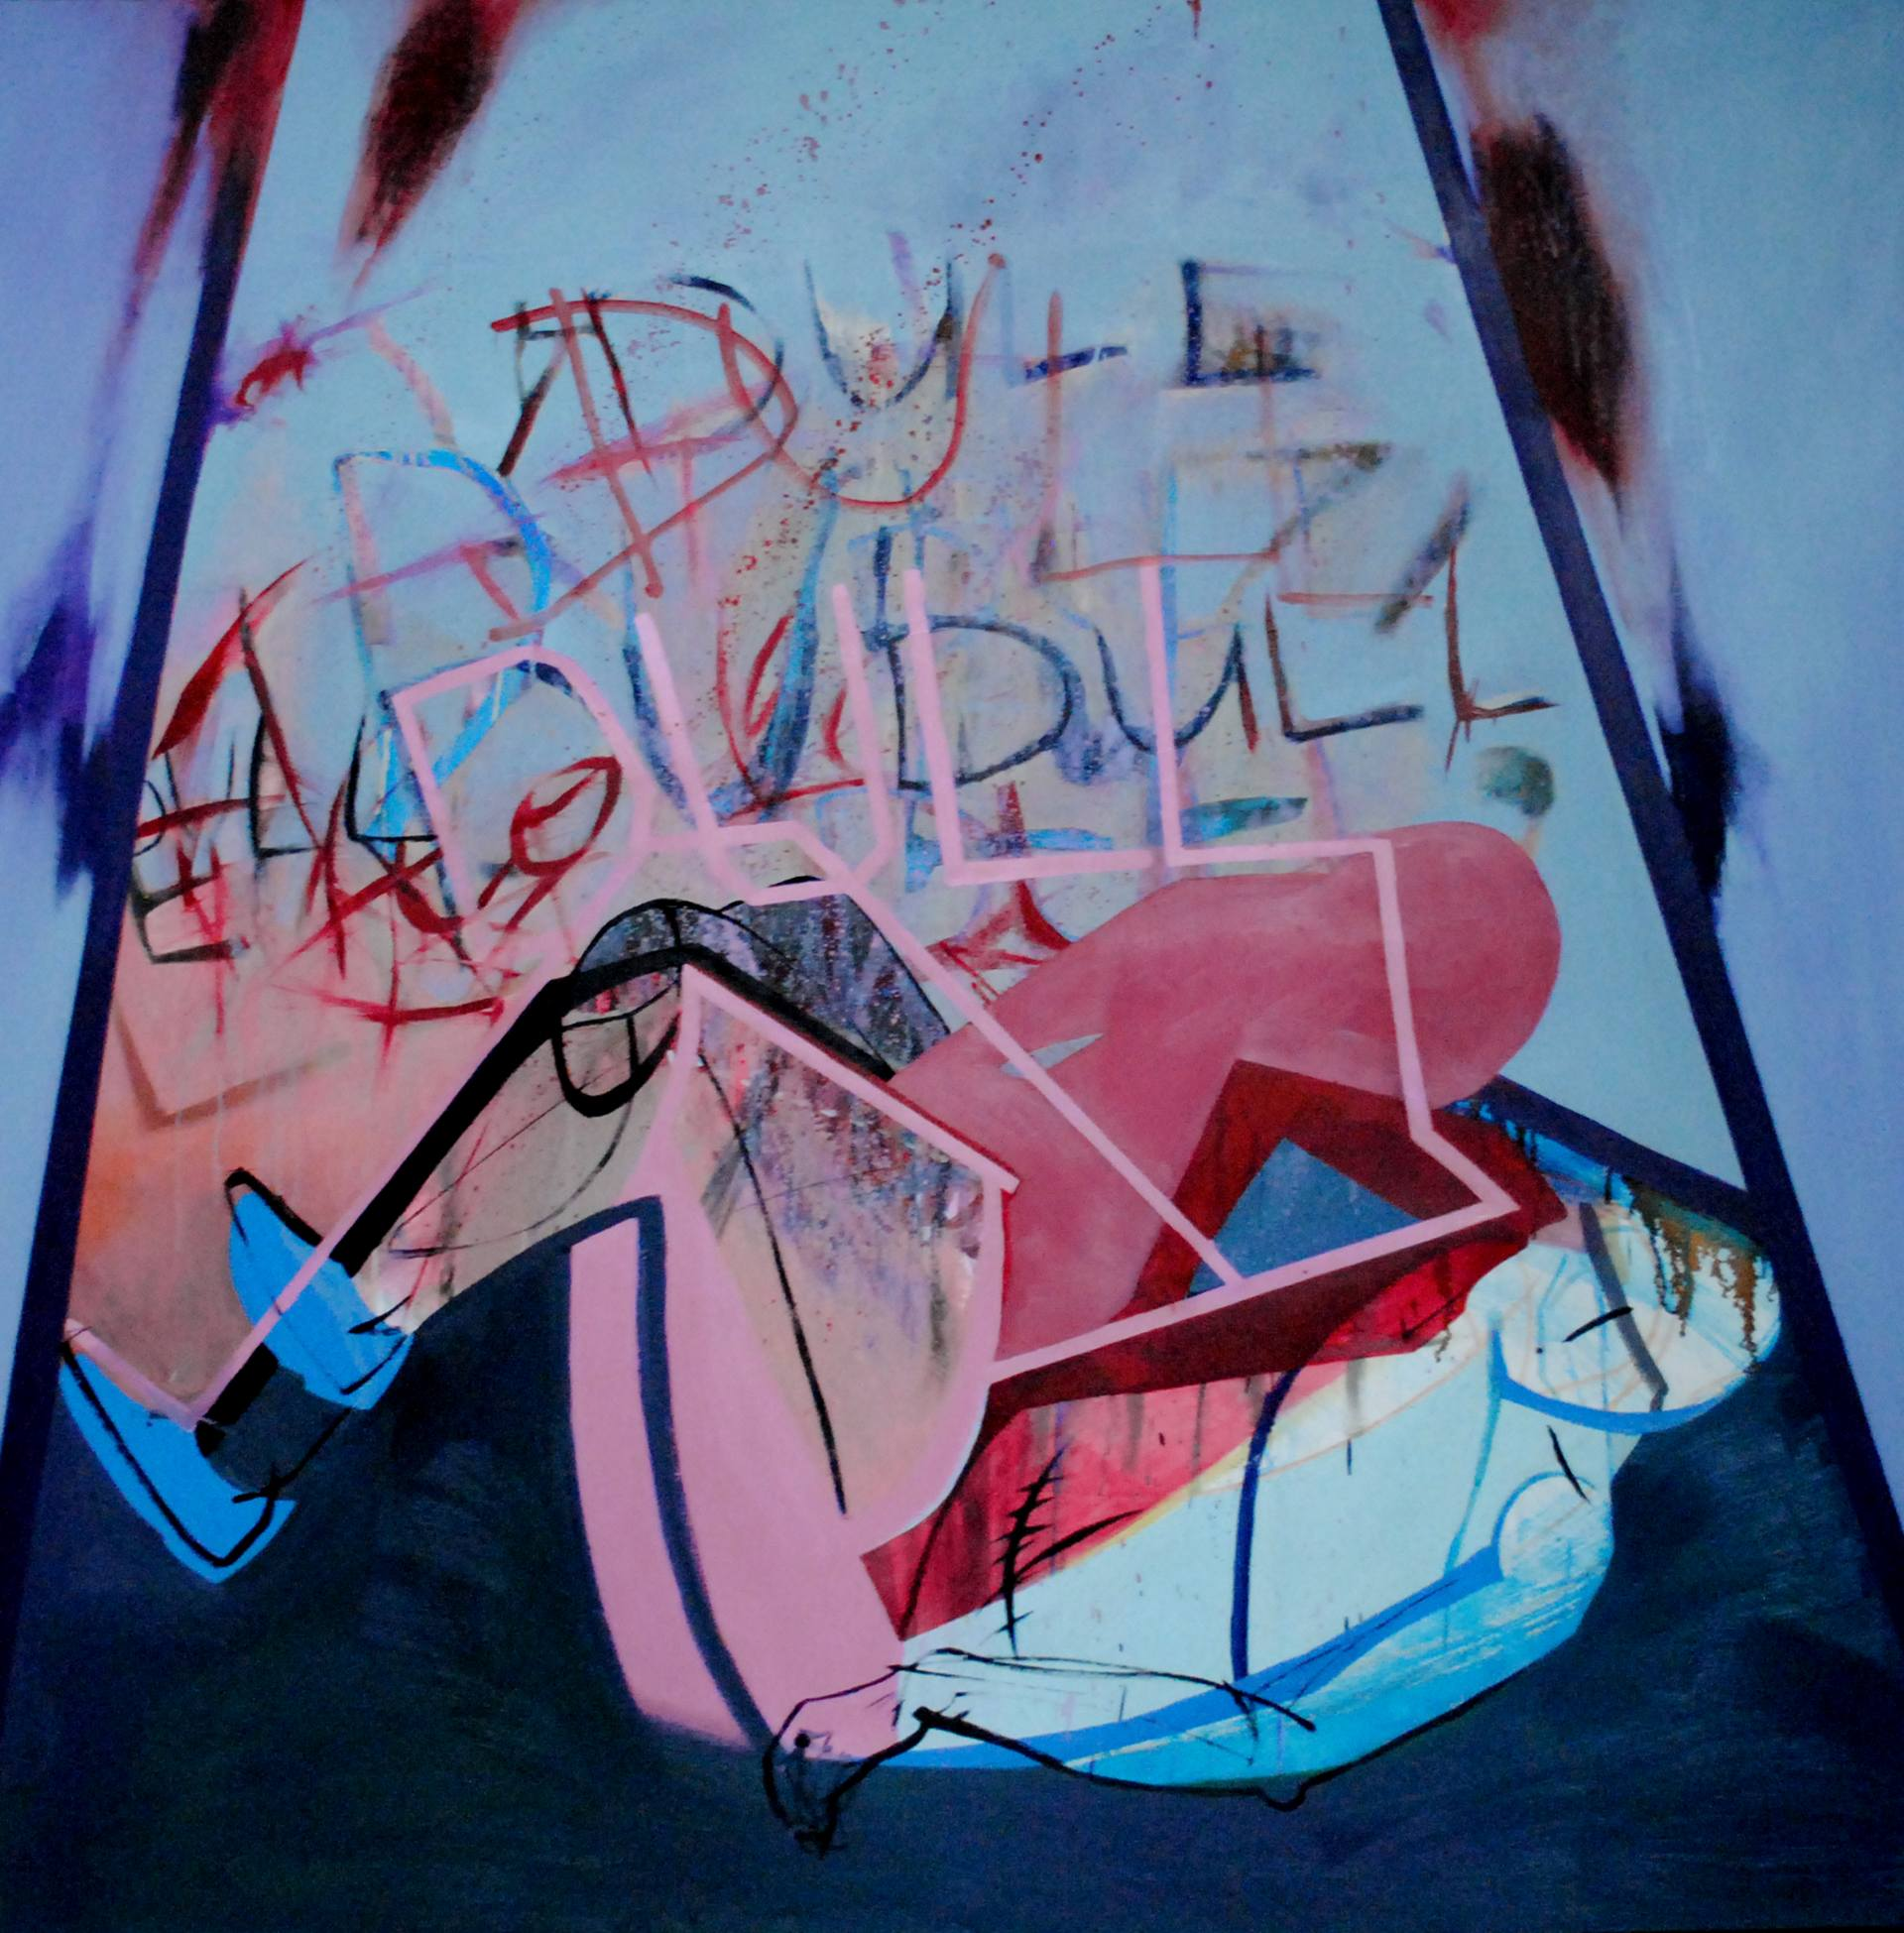 """Dull"", Agata Czeremuszkin-Chrut, Oil on Canvas, 150x150cm, 2012, 1700€"